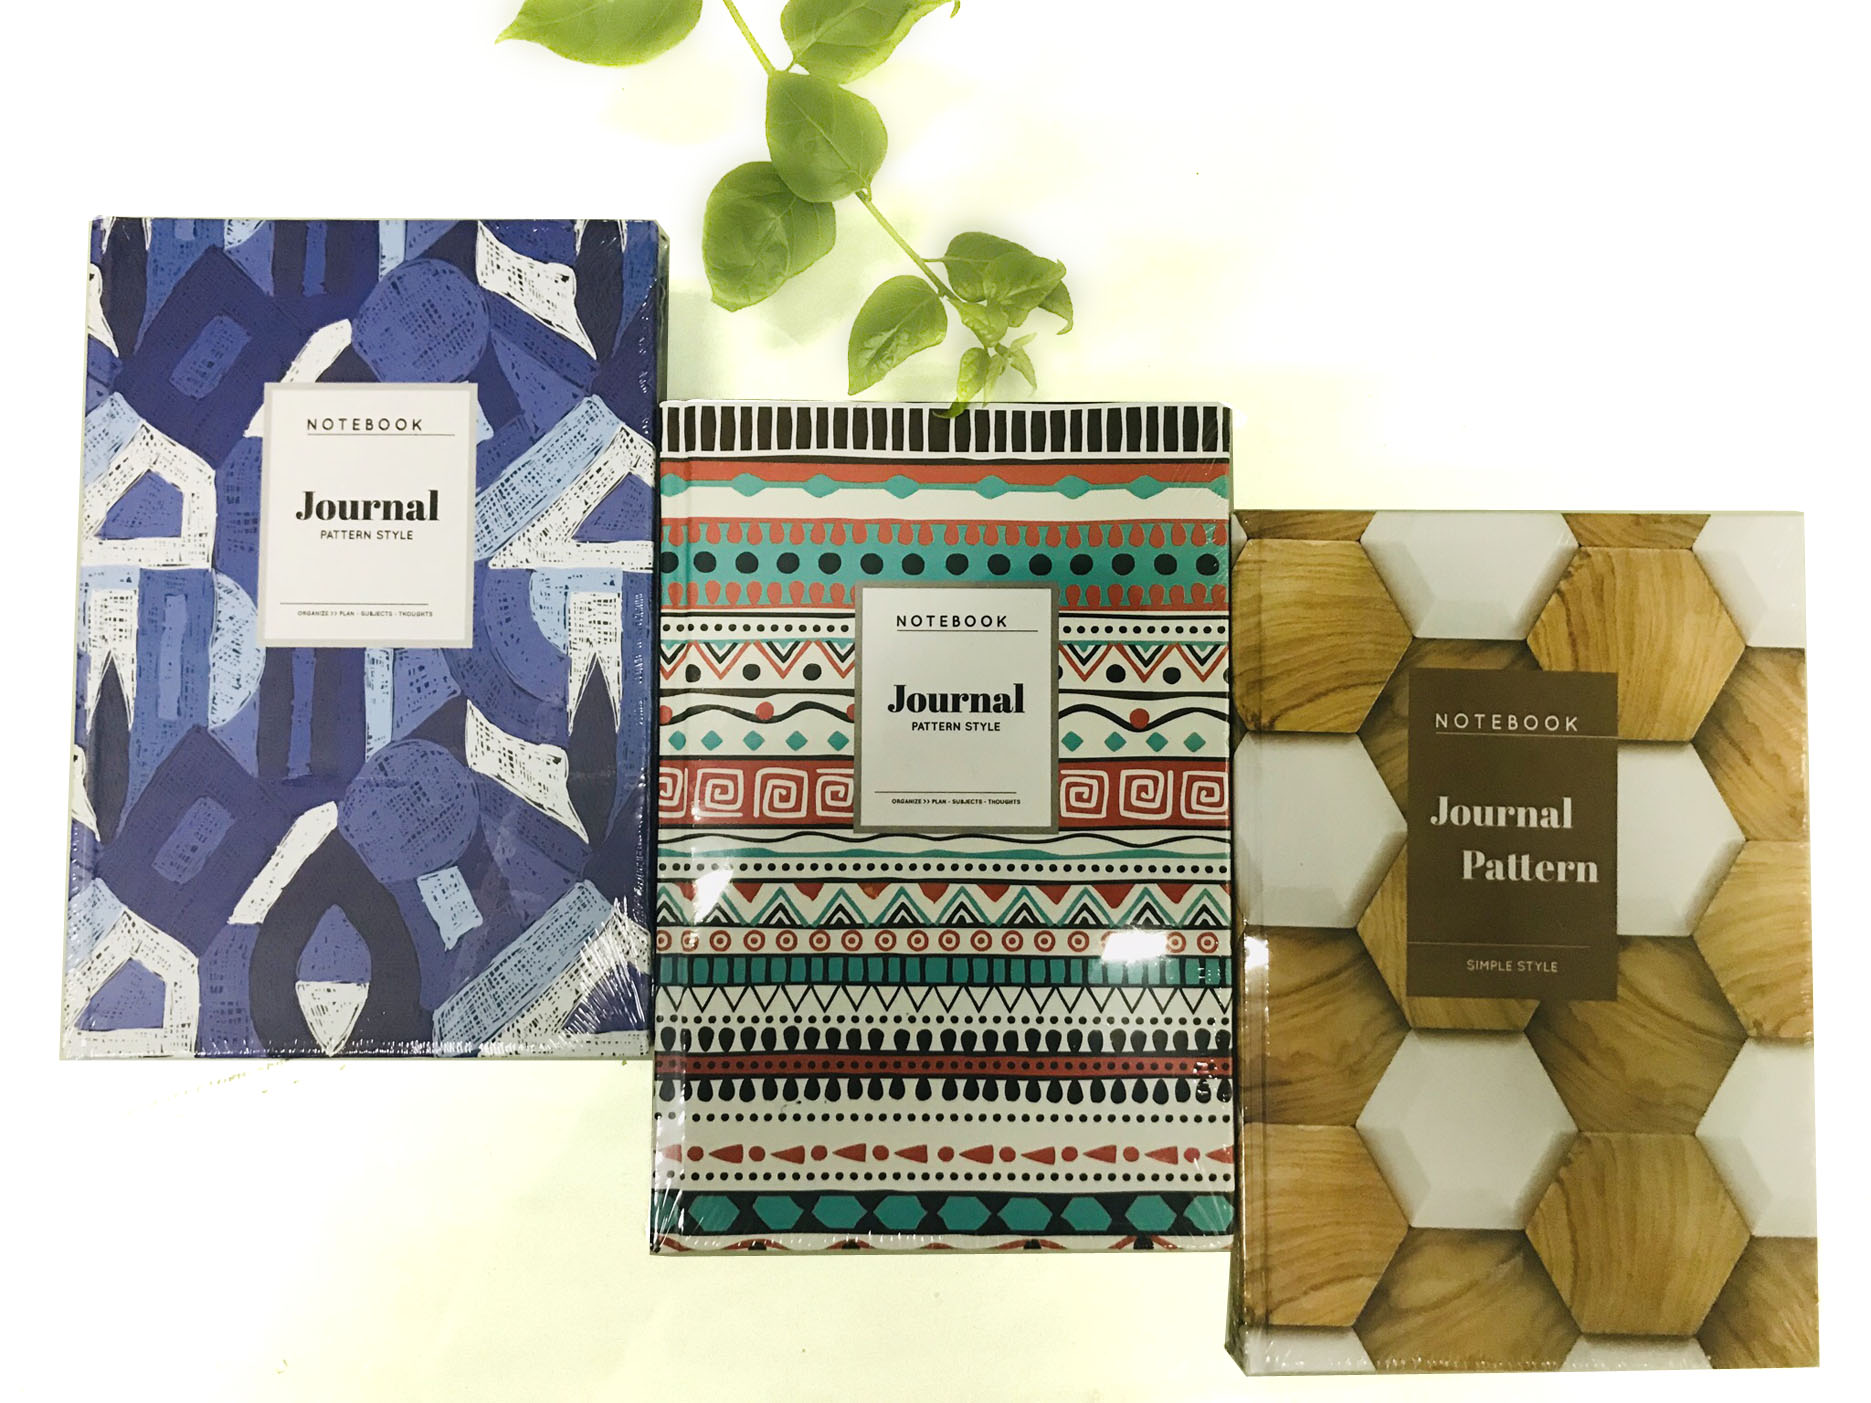 Sổ bìa bồi Journal 5-6-8